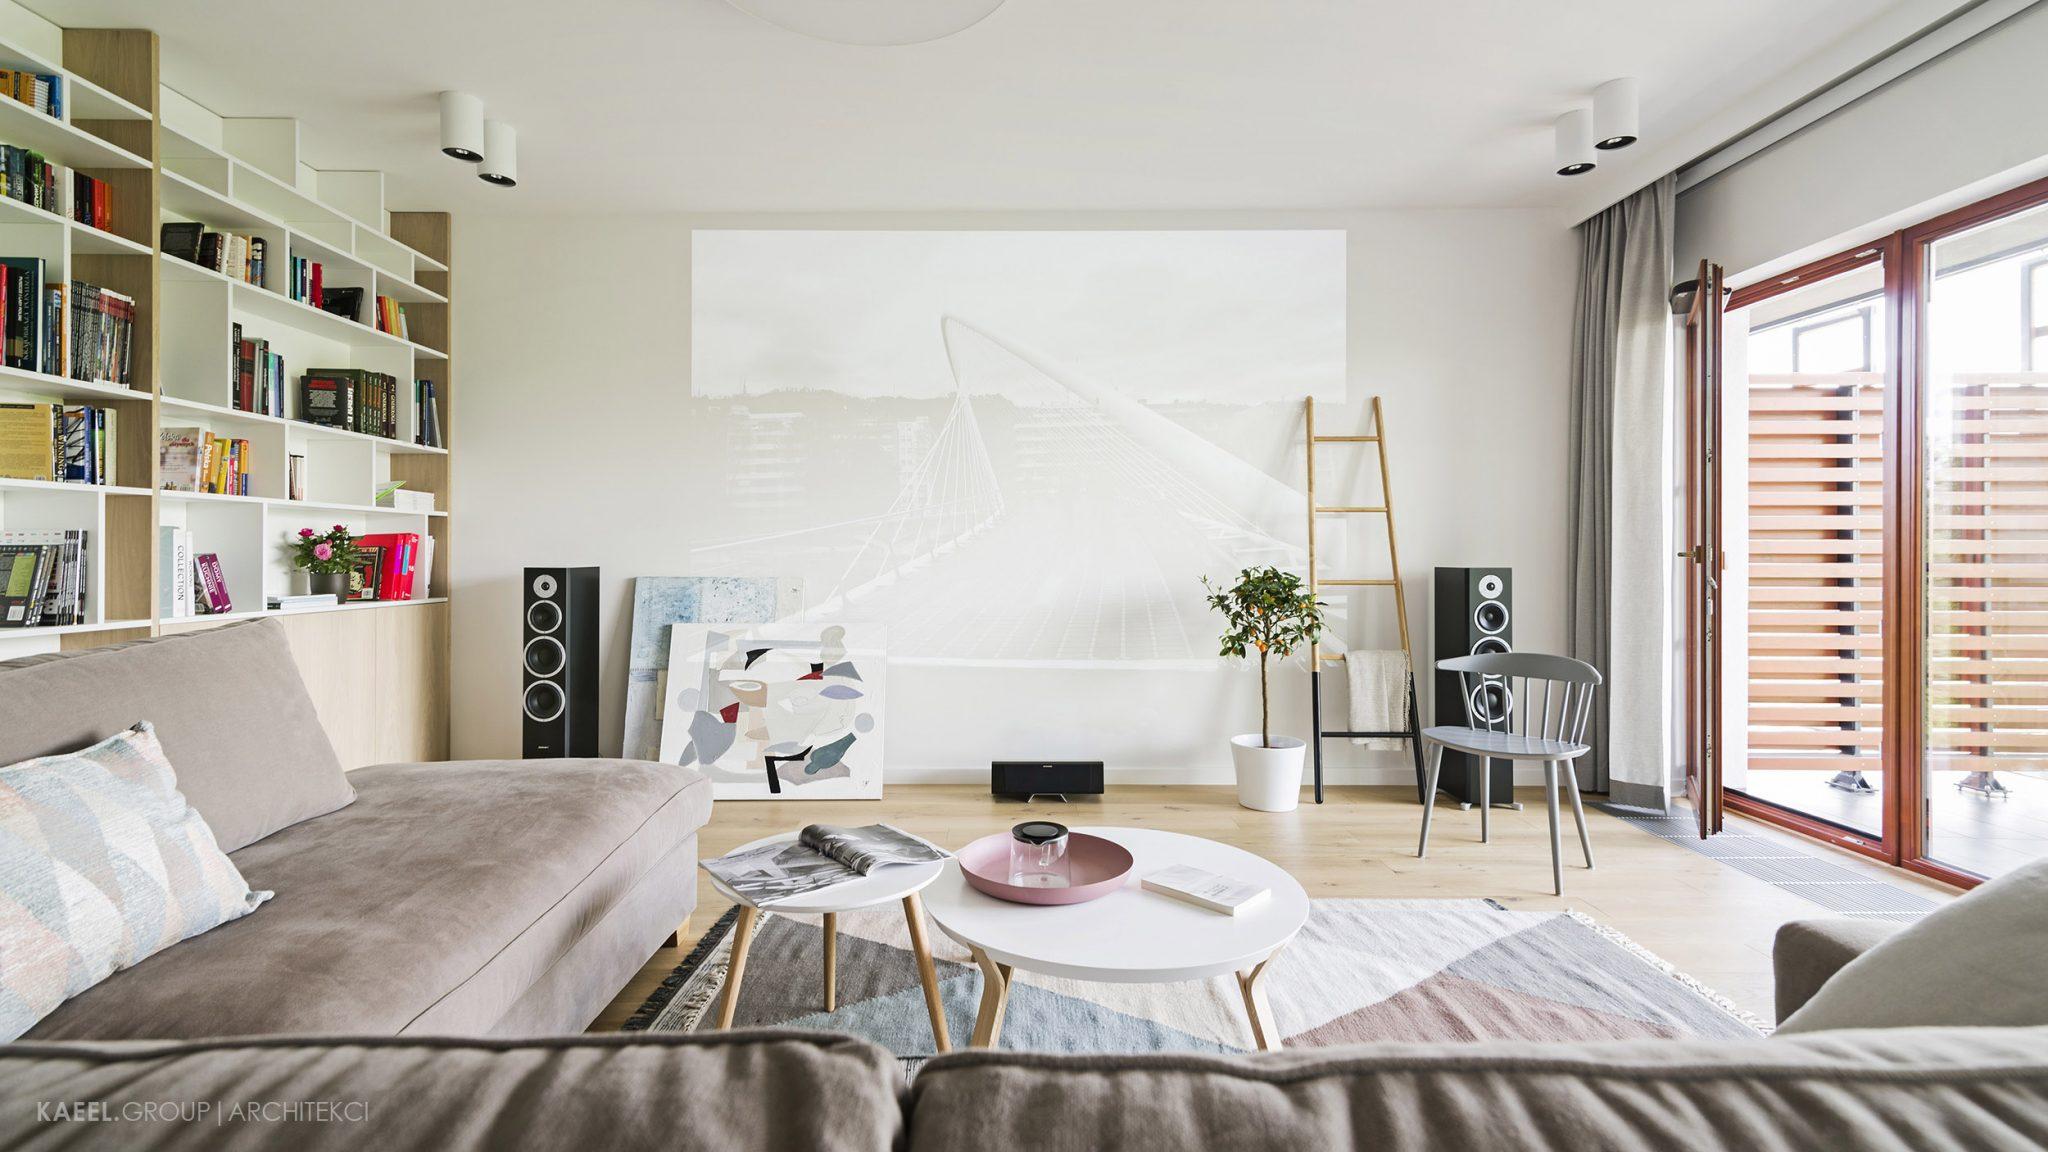 Projektor w mieszkaniu